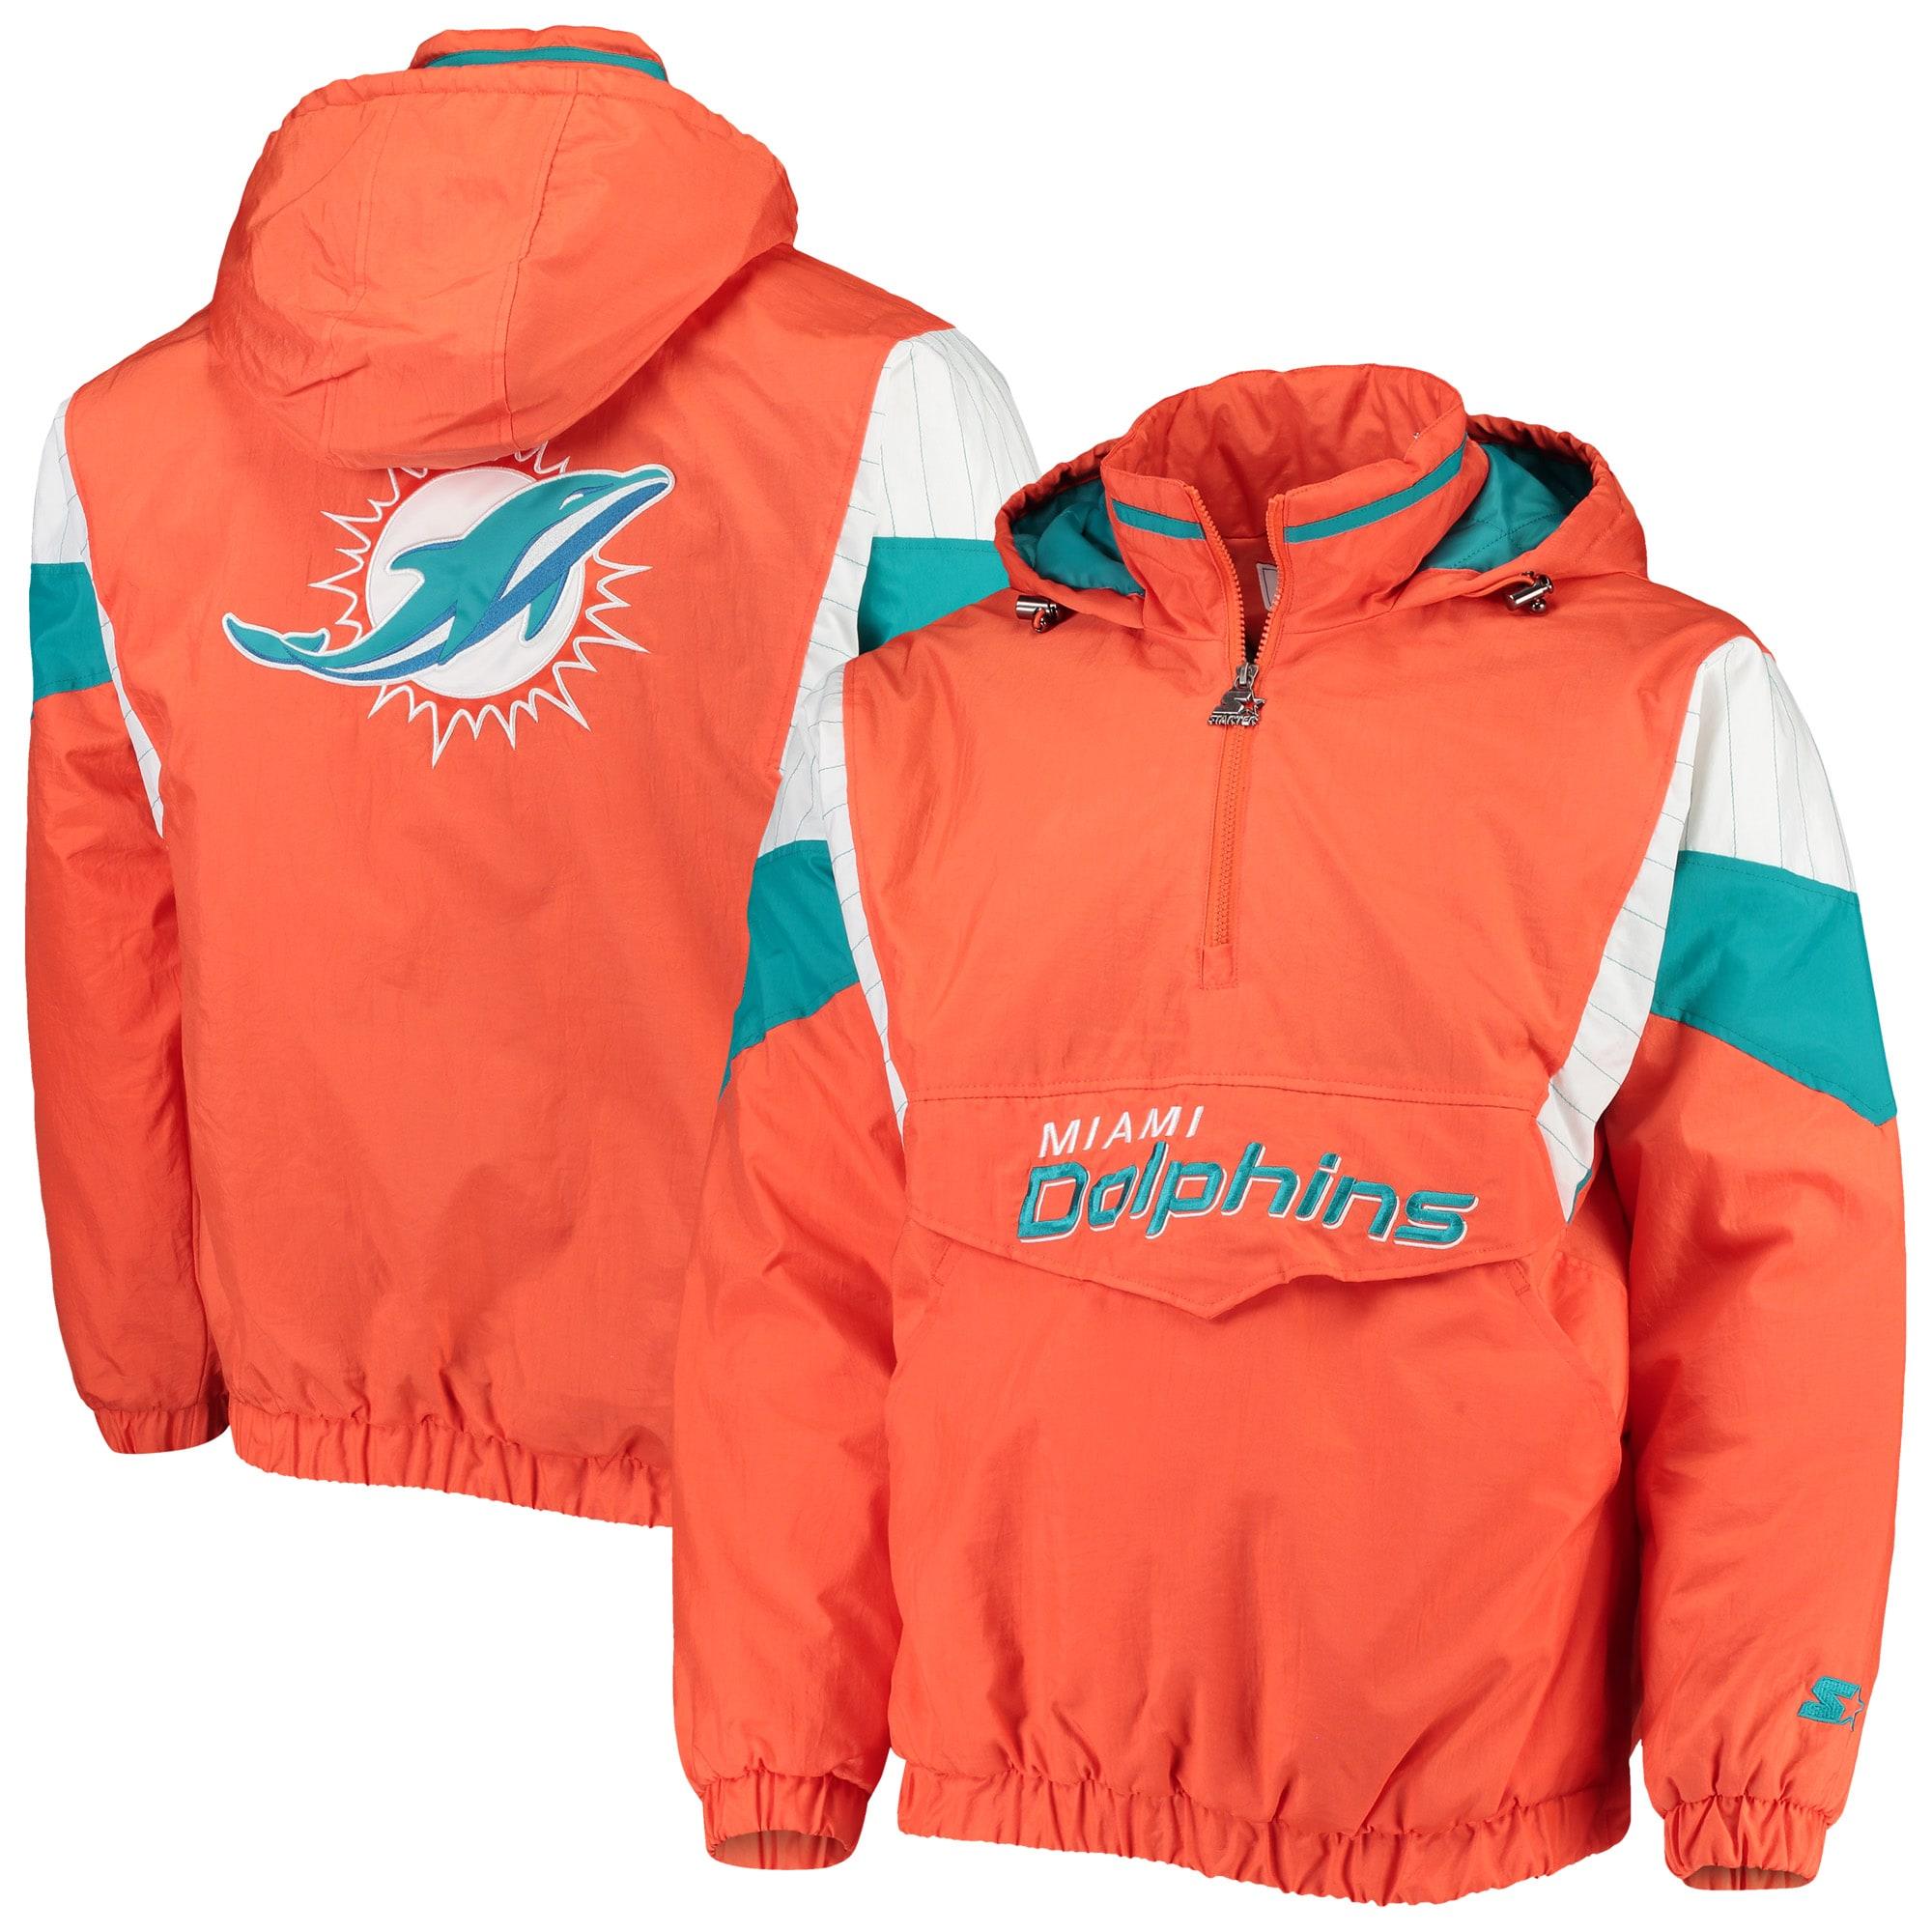 Miami Dolphins Starter NFL 100 Thursday Night Lights Quarter-Zip Breakaway Jacket - Orange/Aqua